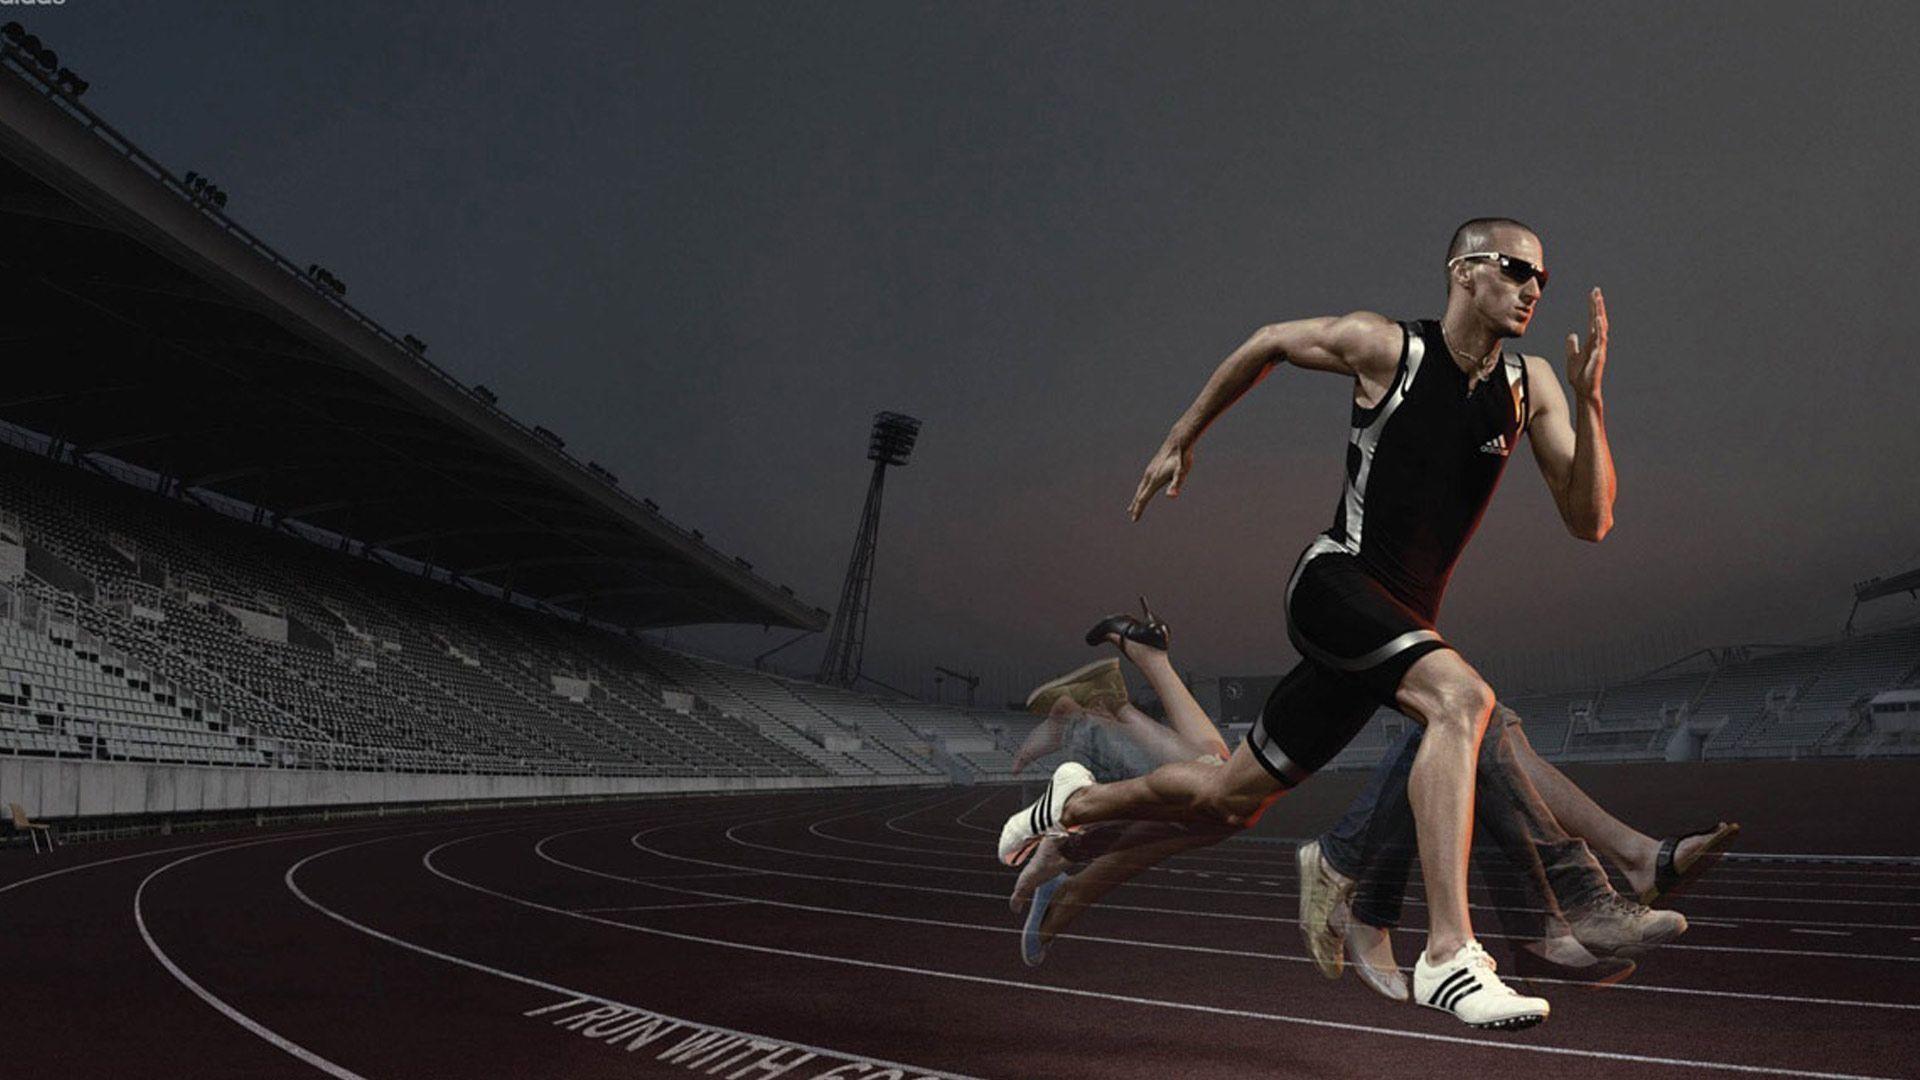 Athlete Motivation Wallpapers – WallpaperSafari